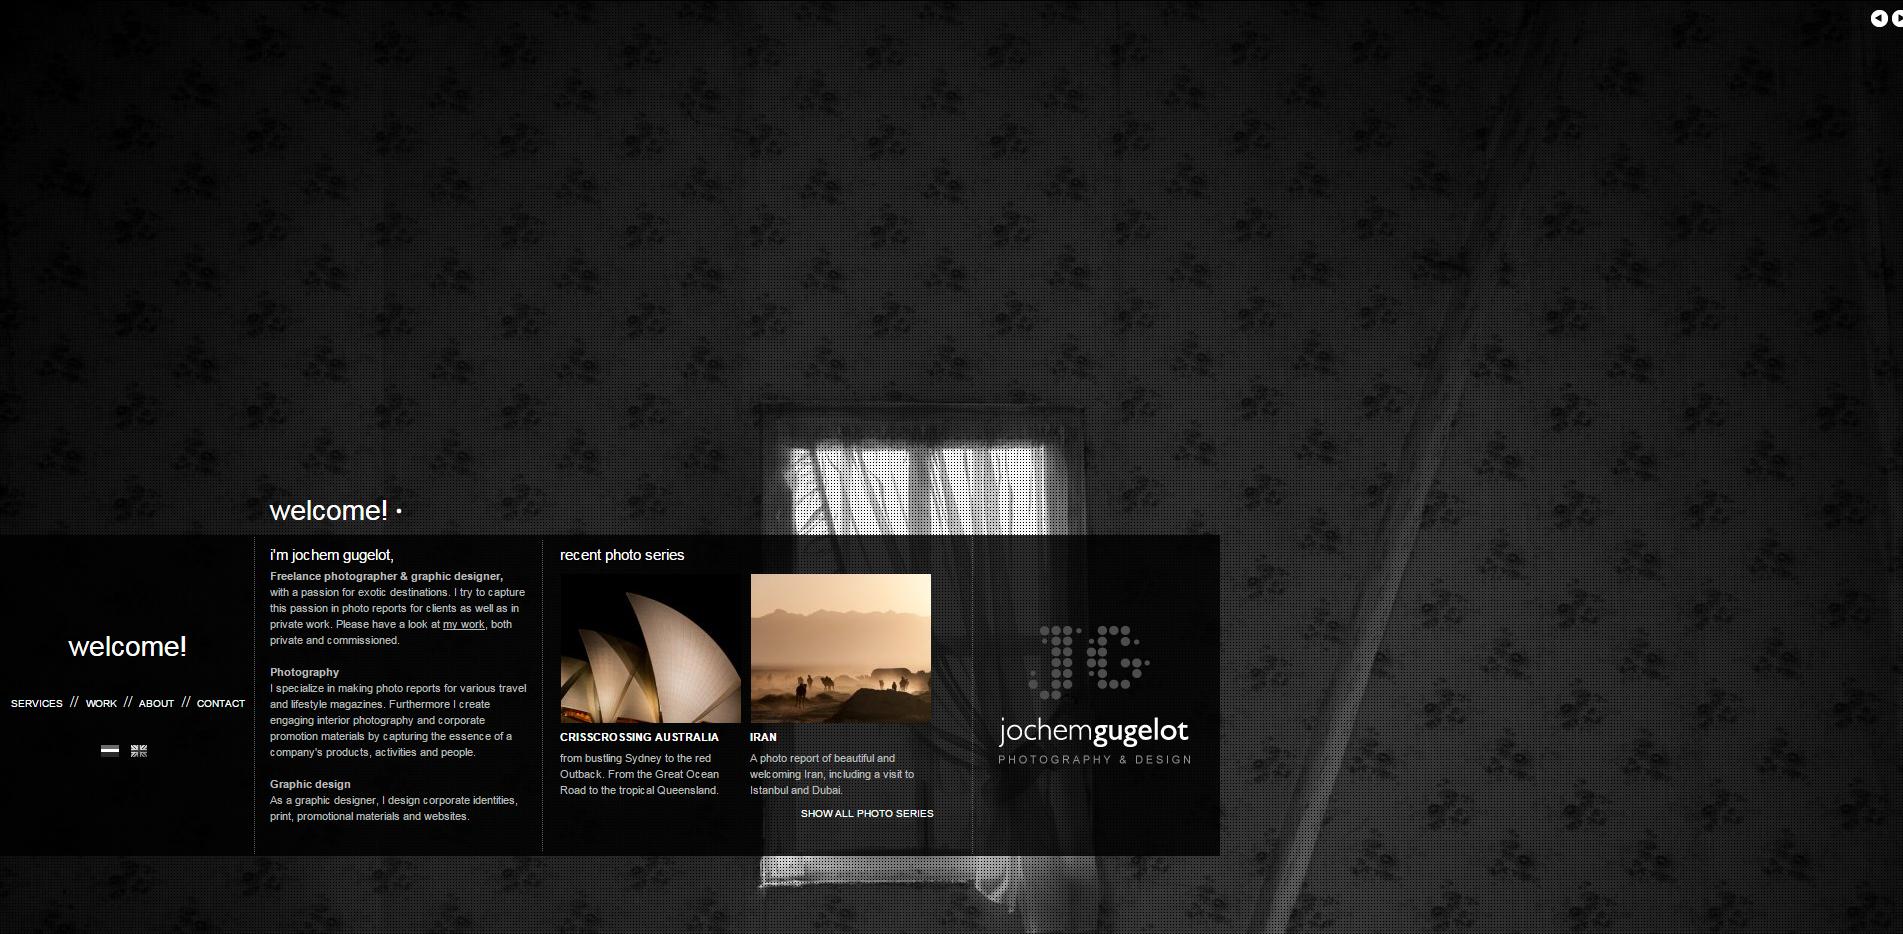 Photography-Websites-Inspiration-012